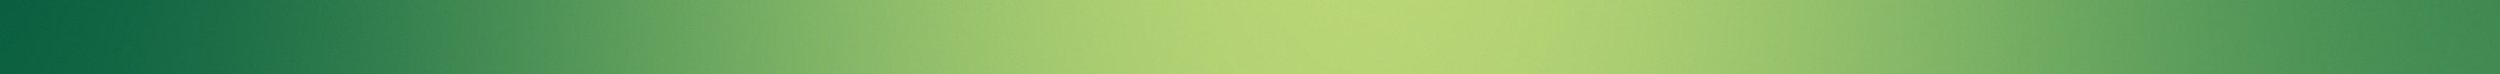 green-gradient-wallpaper-26051-26736-hd-wallpapers.jpg